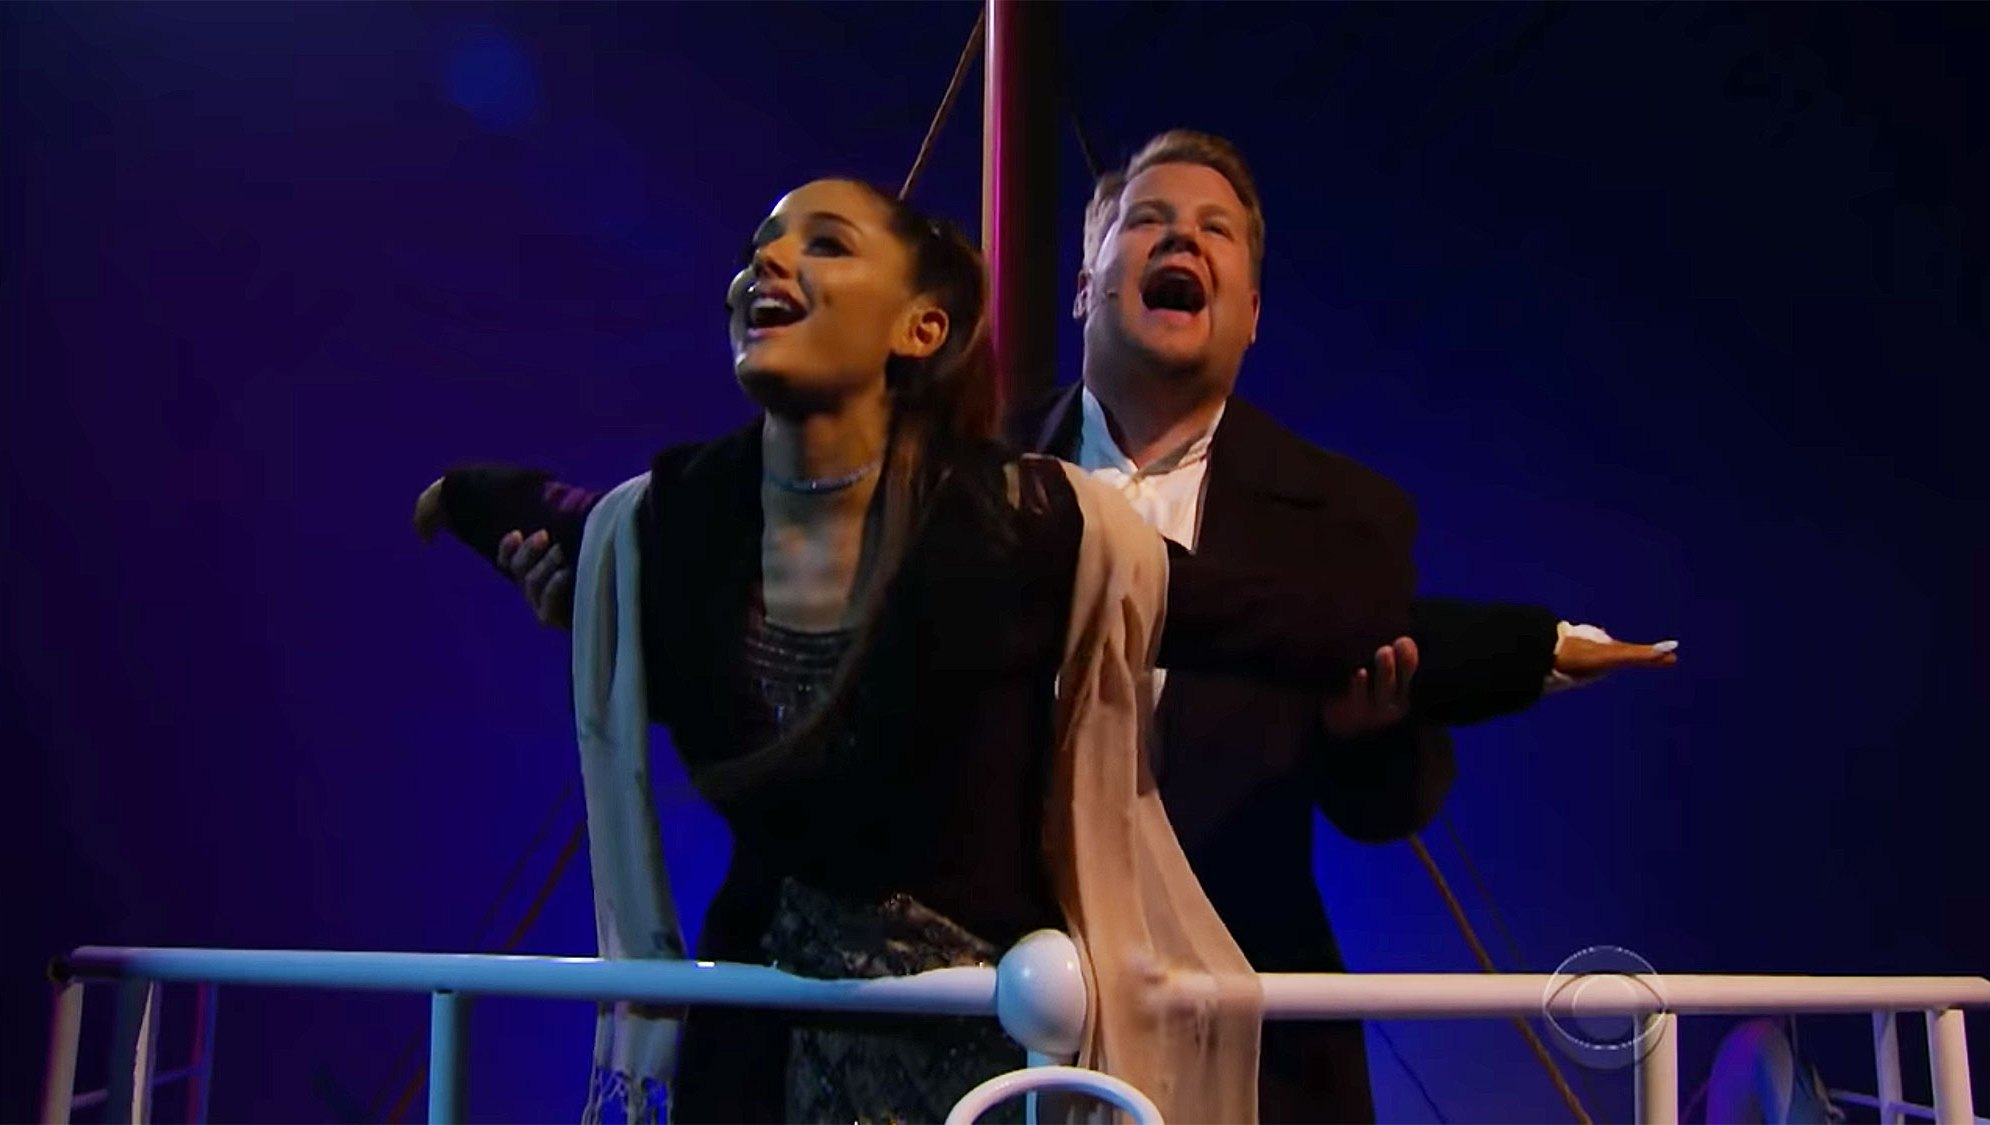 ariana grande james corden titanic soundtrack the late late show